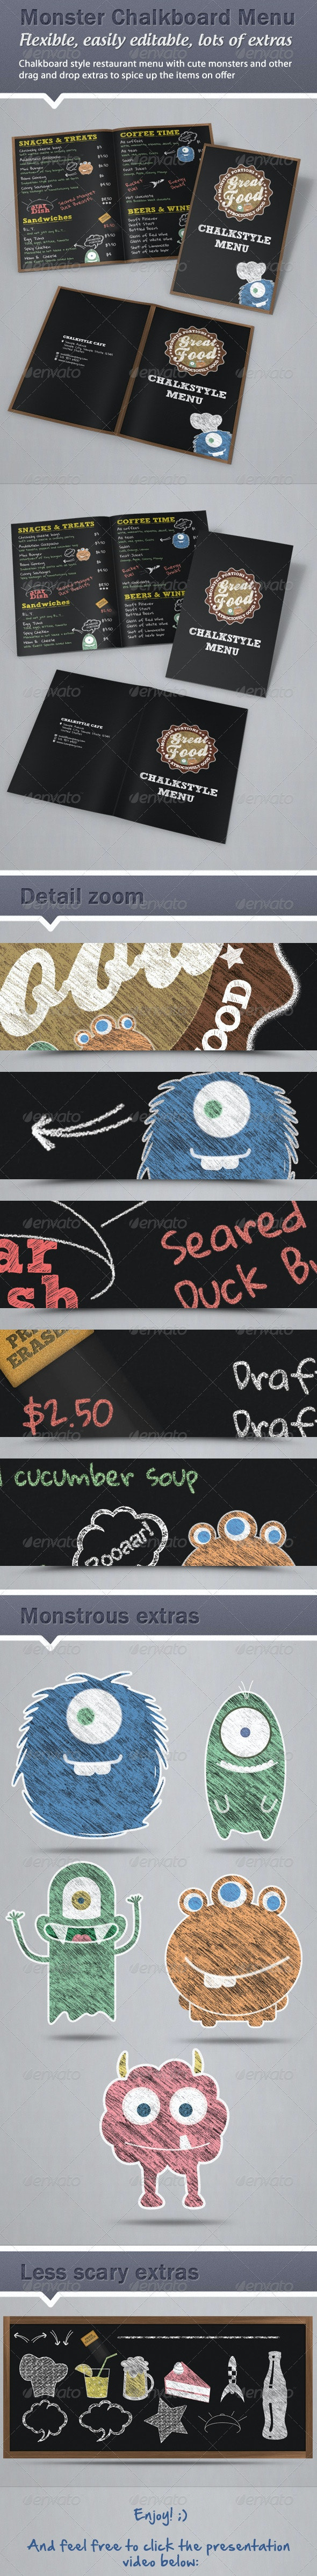 Monster Chalkboard Menu - Food Menus Print Templates